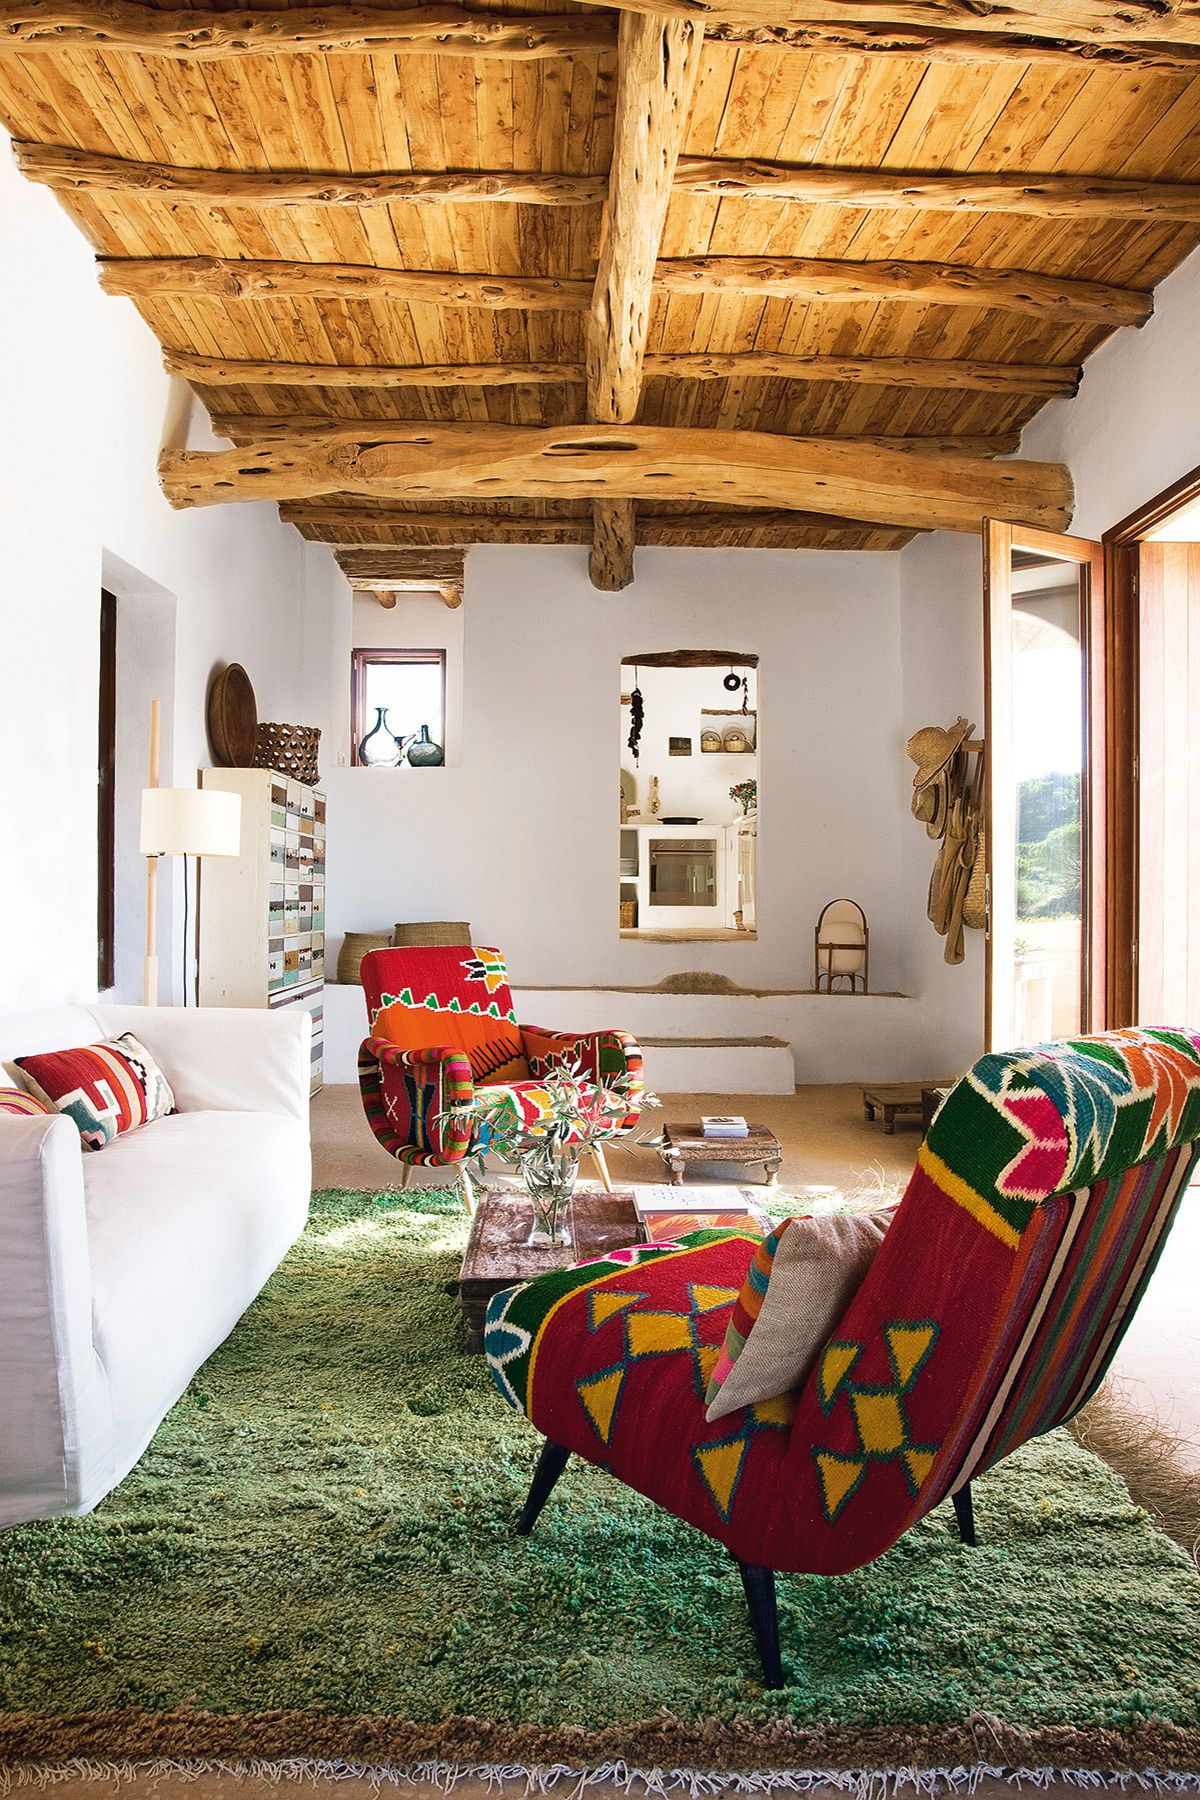 Ibiza original sofas livings pinterest casas for Decoracion de casas brasilenas